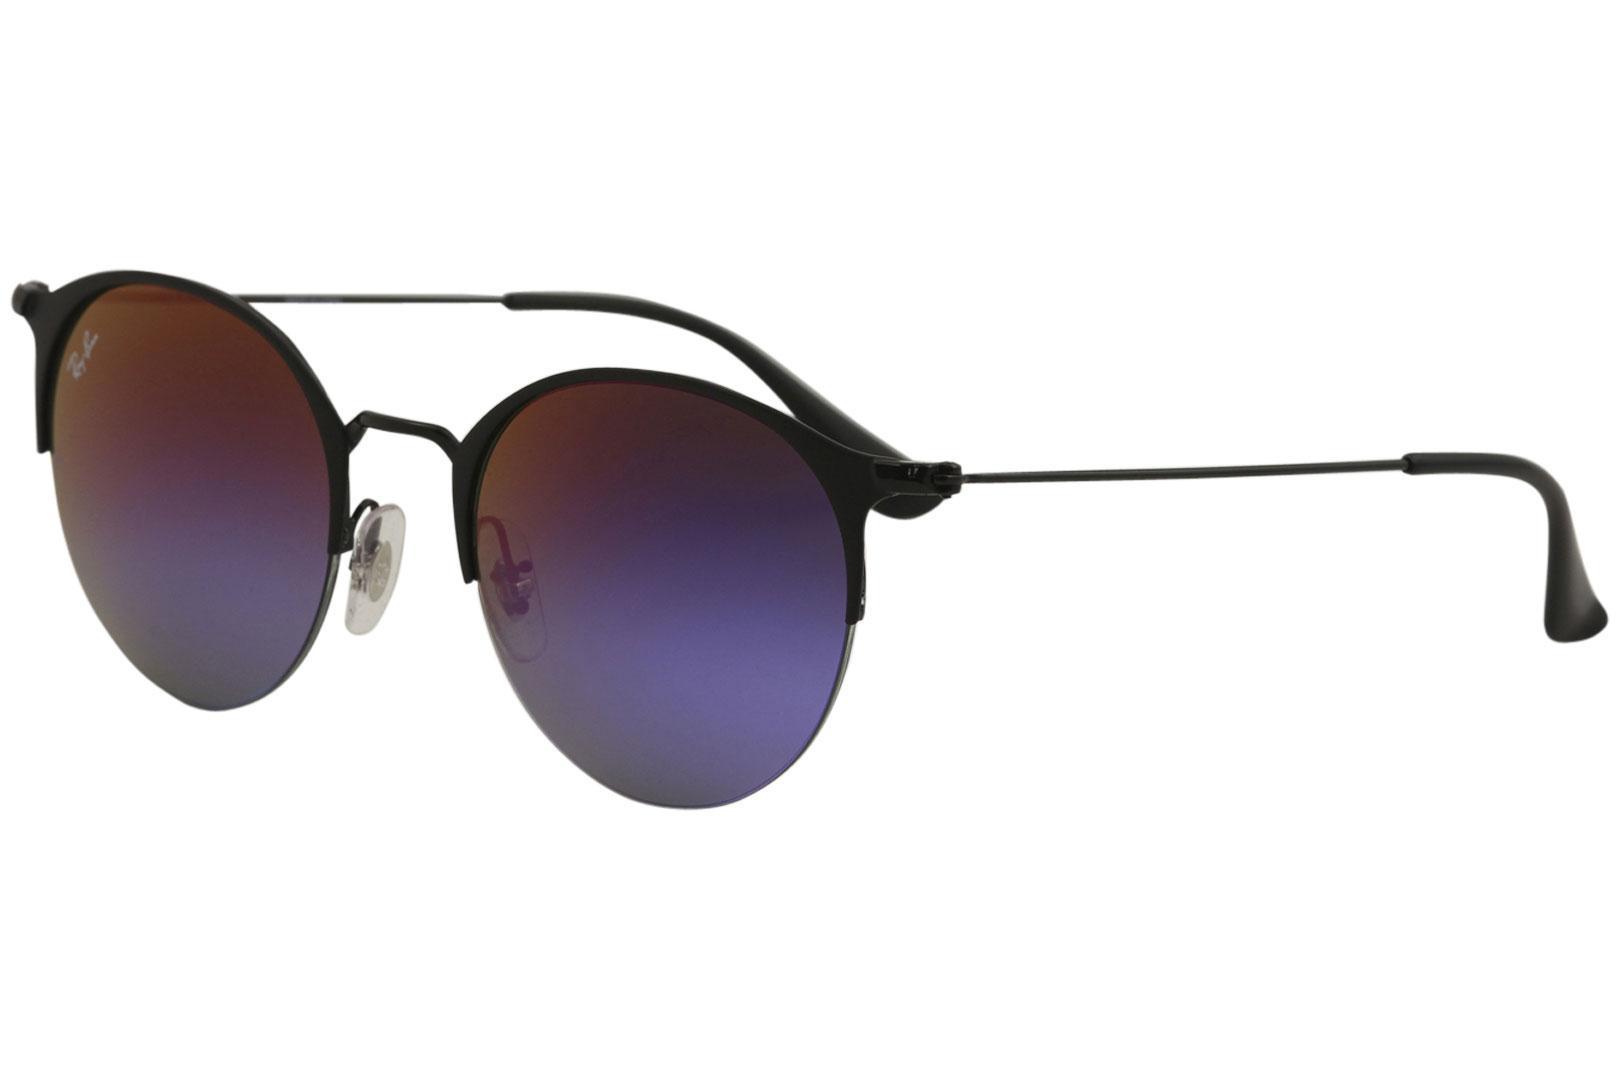 Fashion Ray Rayban Rb3578 Ban Women's Sunglasses Round wOOzTrqWI